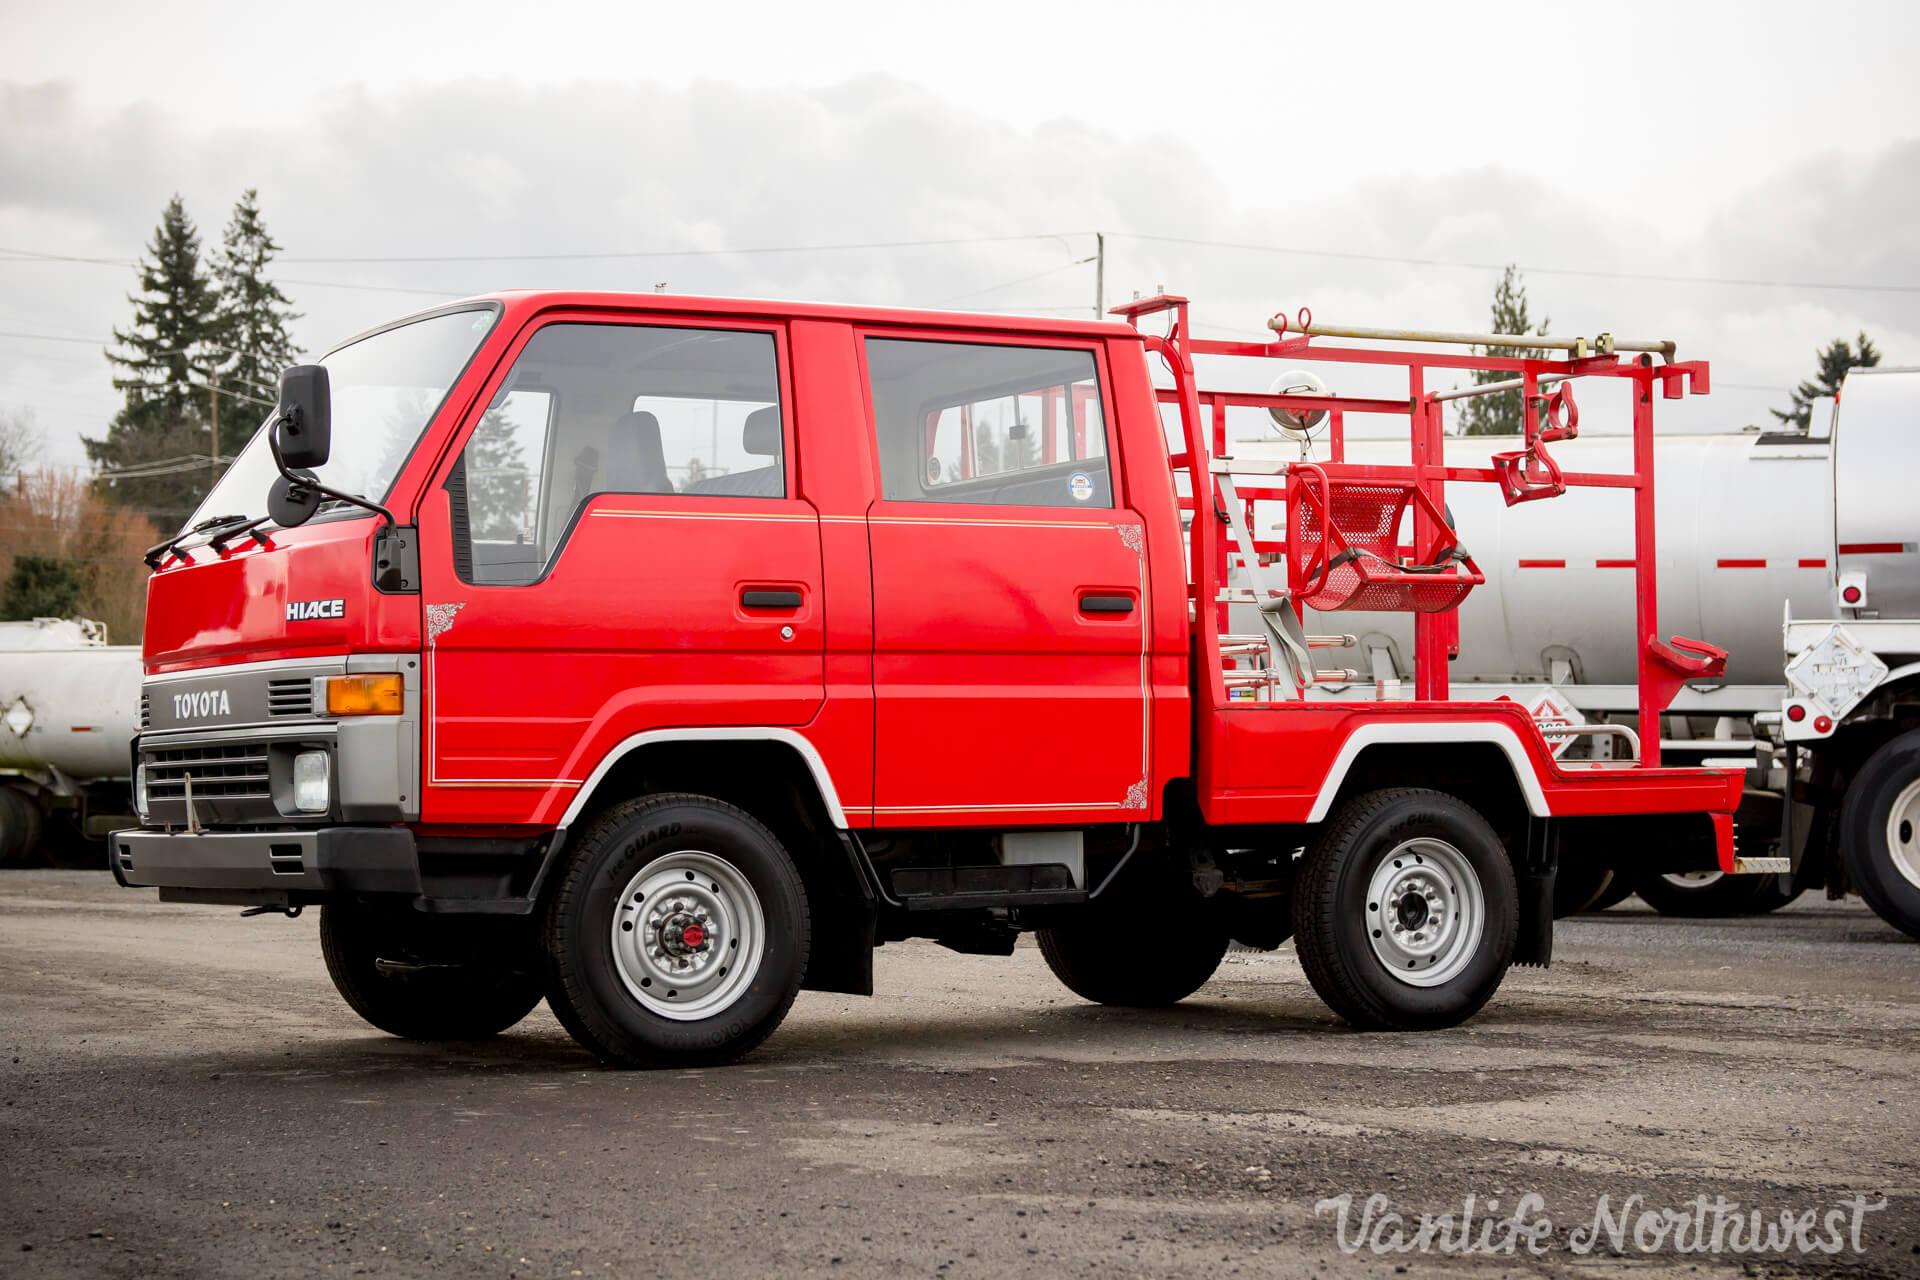 ToyotaHiaceFireTruckLH851990-12.jpg